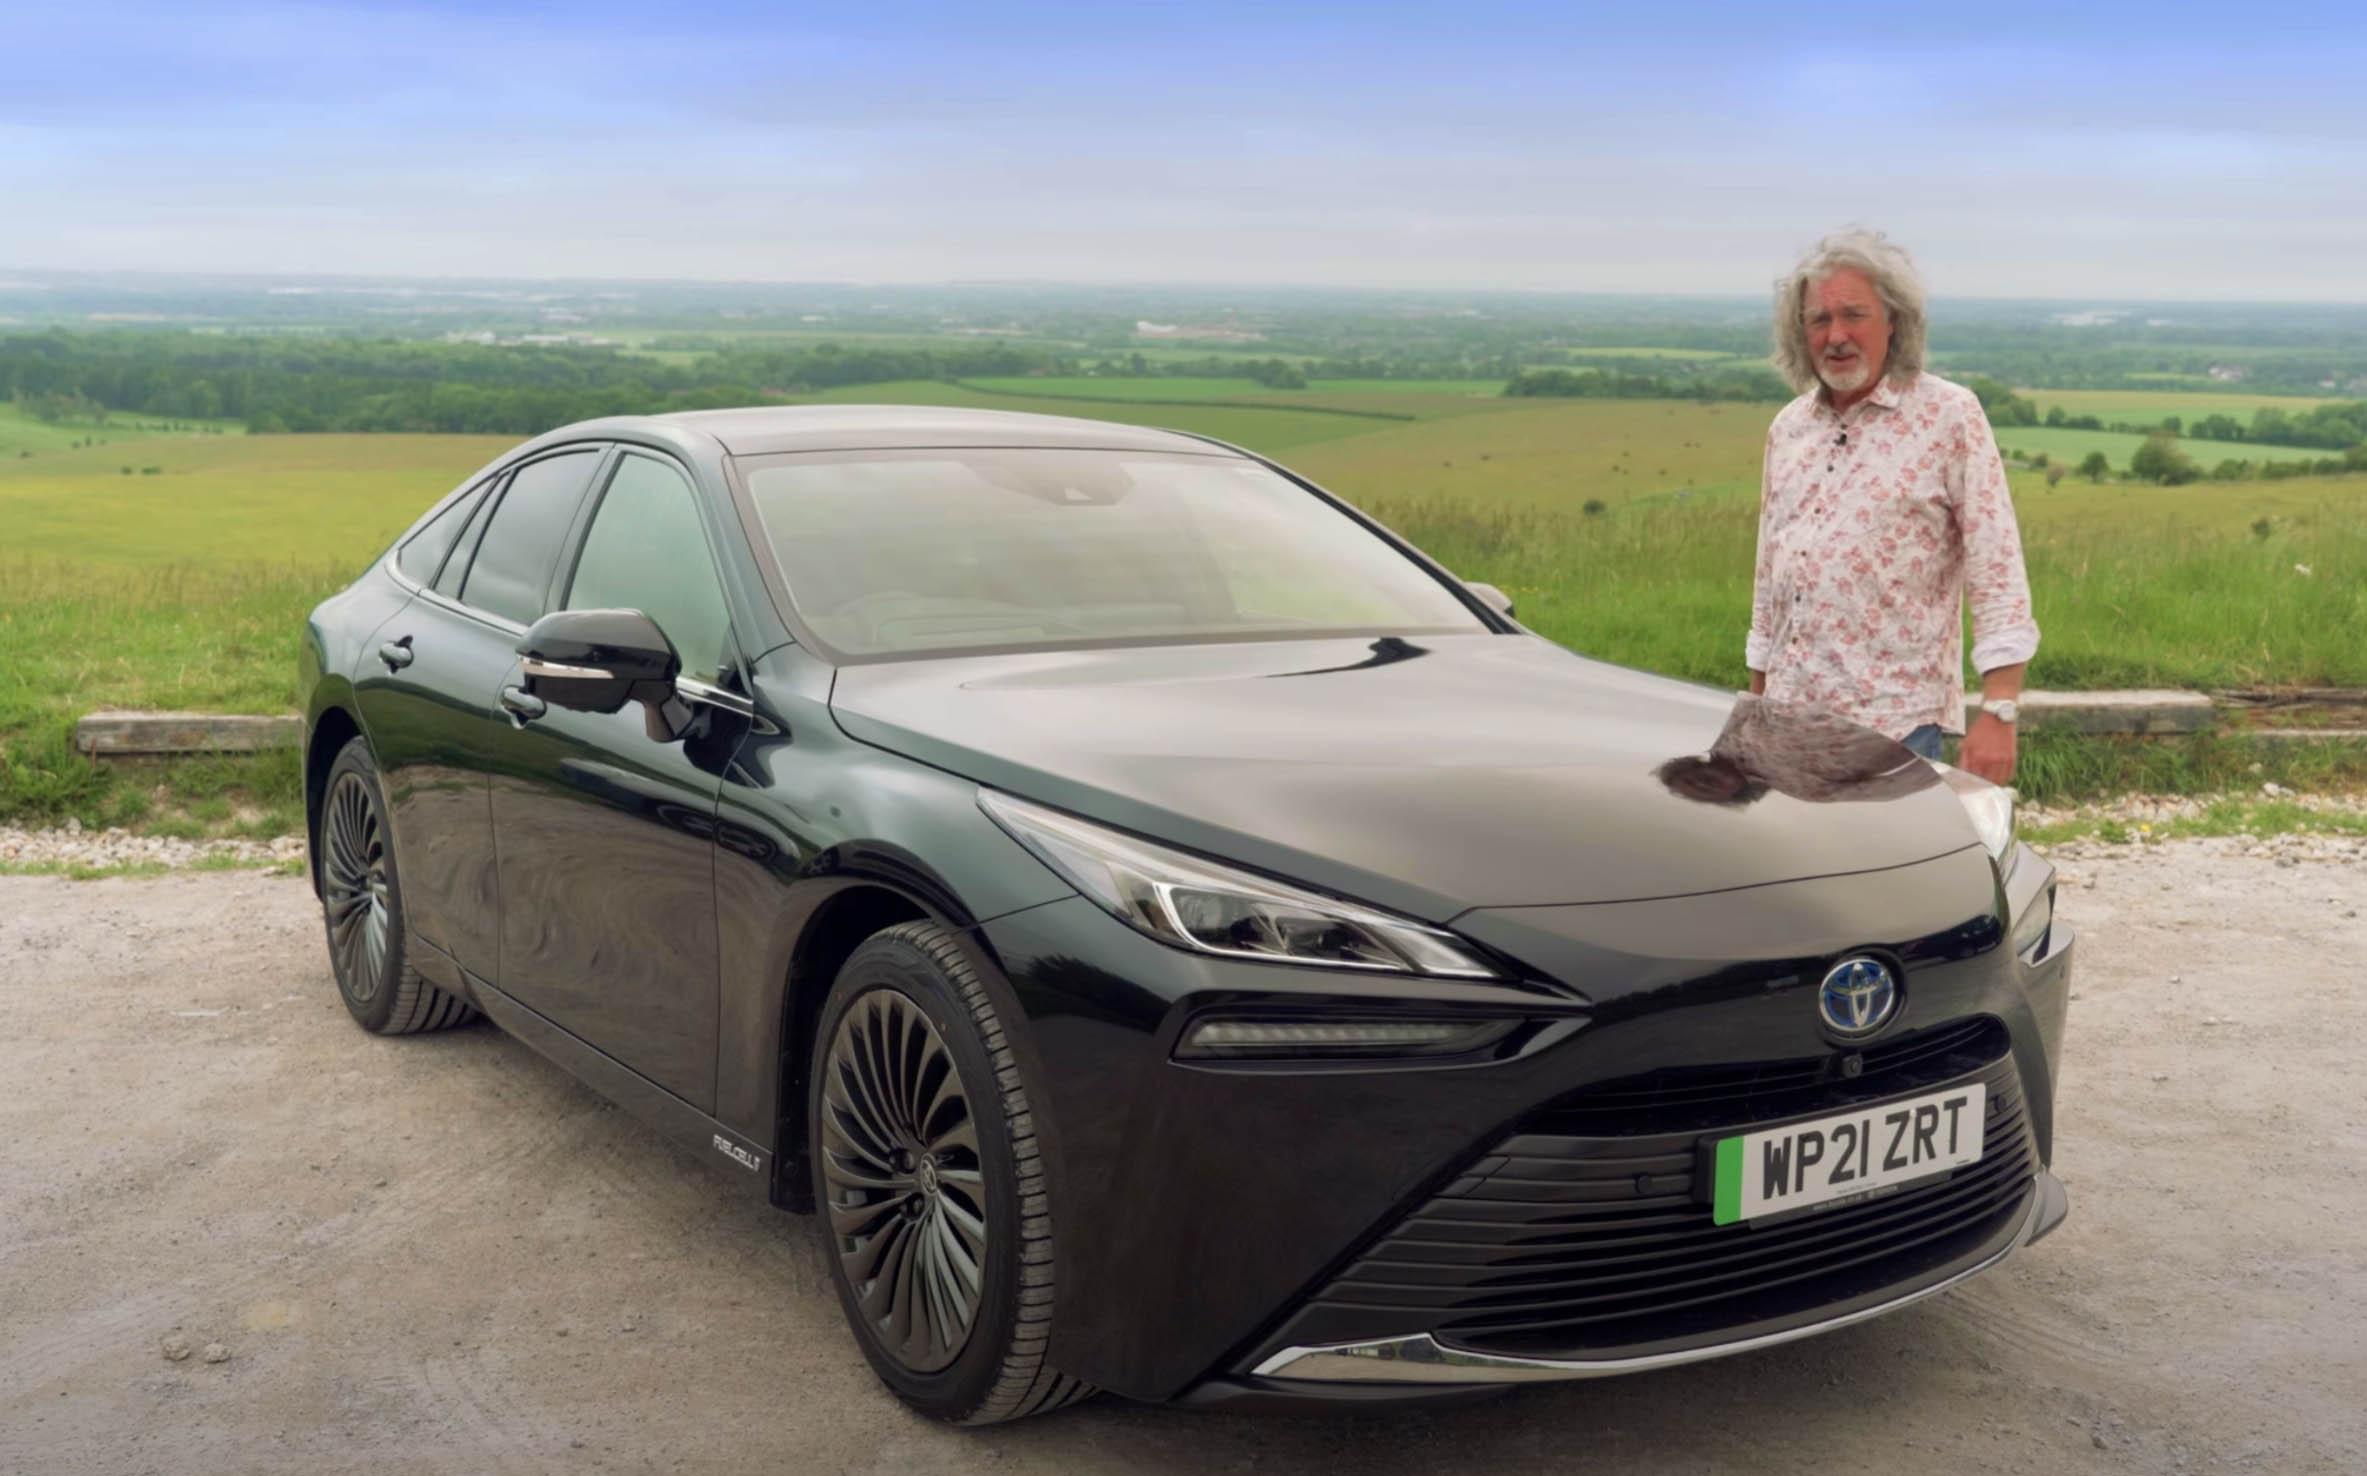 James May's New Toyota Mirai